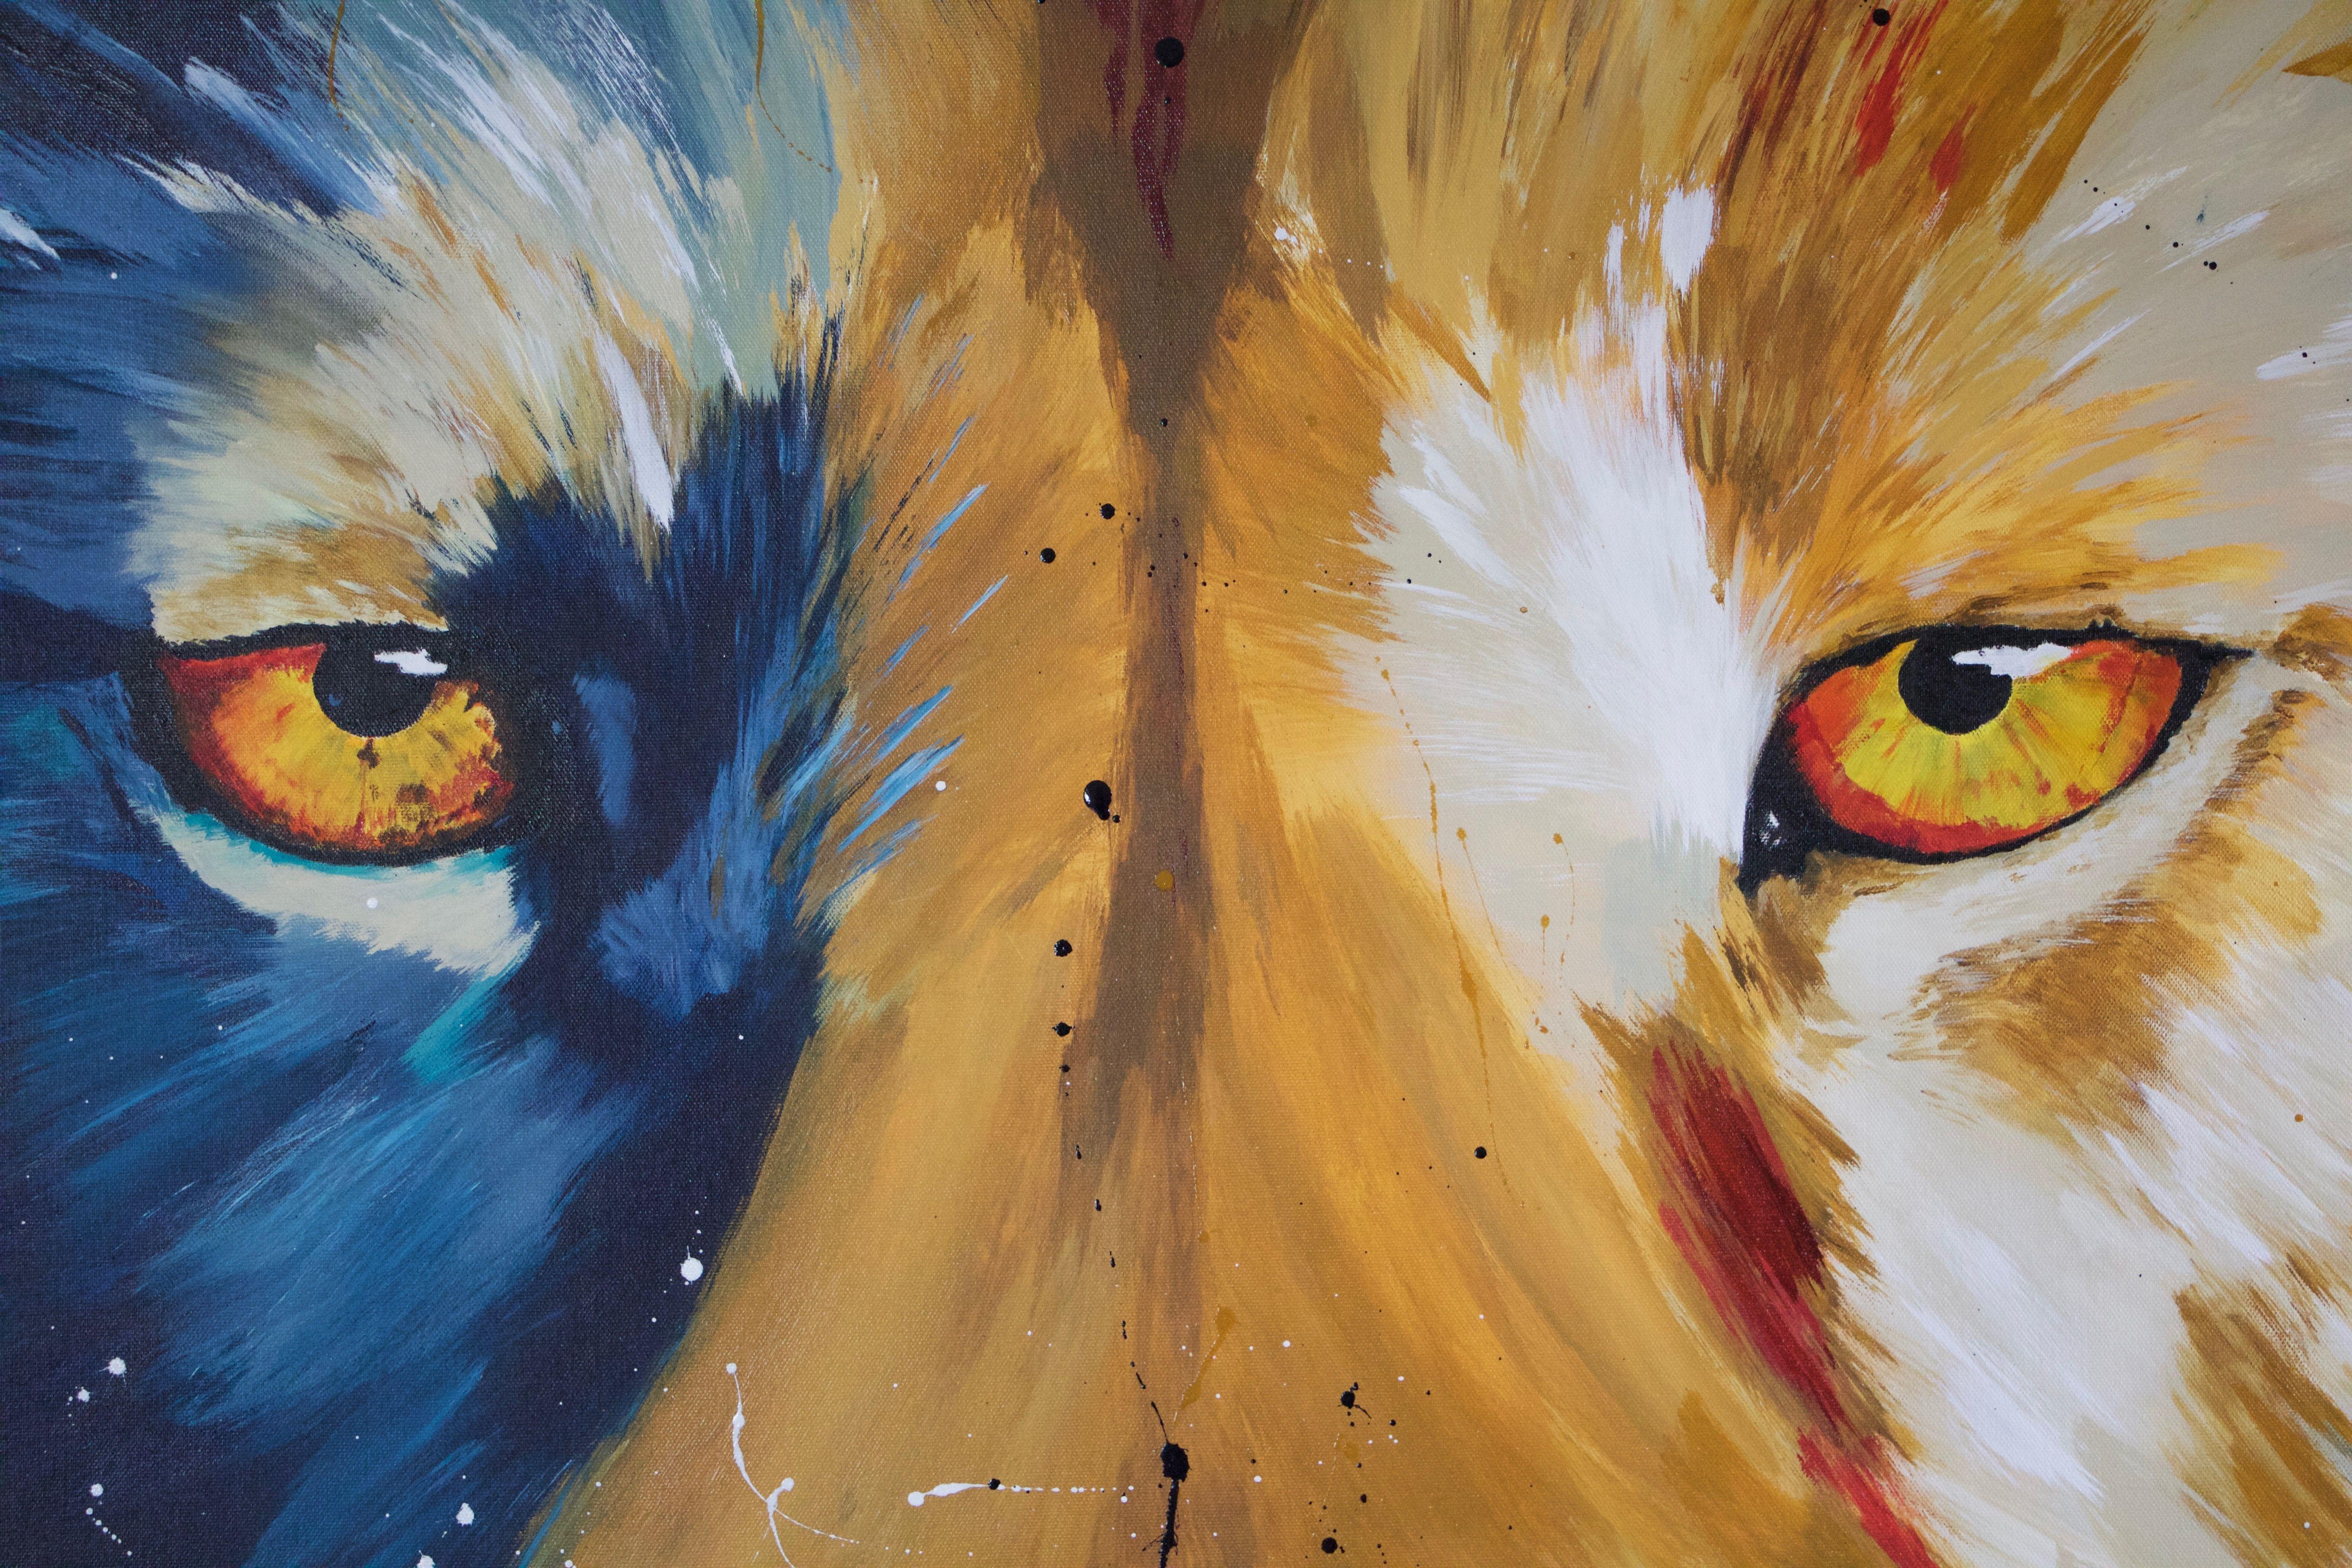 Löwe / Lion Acrylic Painting by Daniel Schausberger 150x100 cm